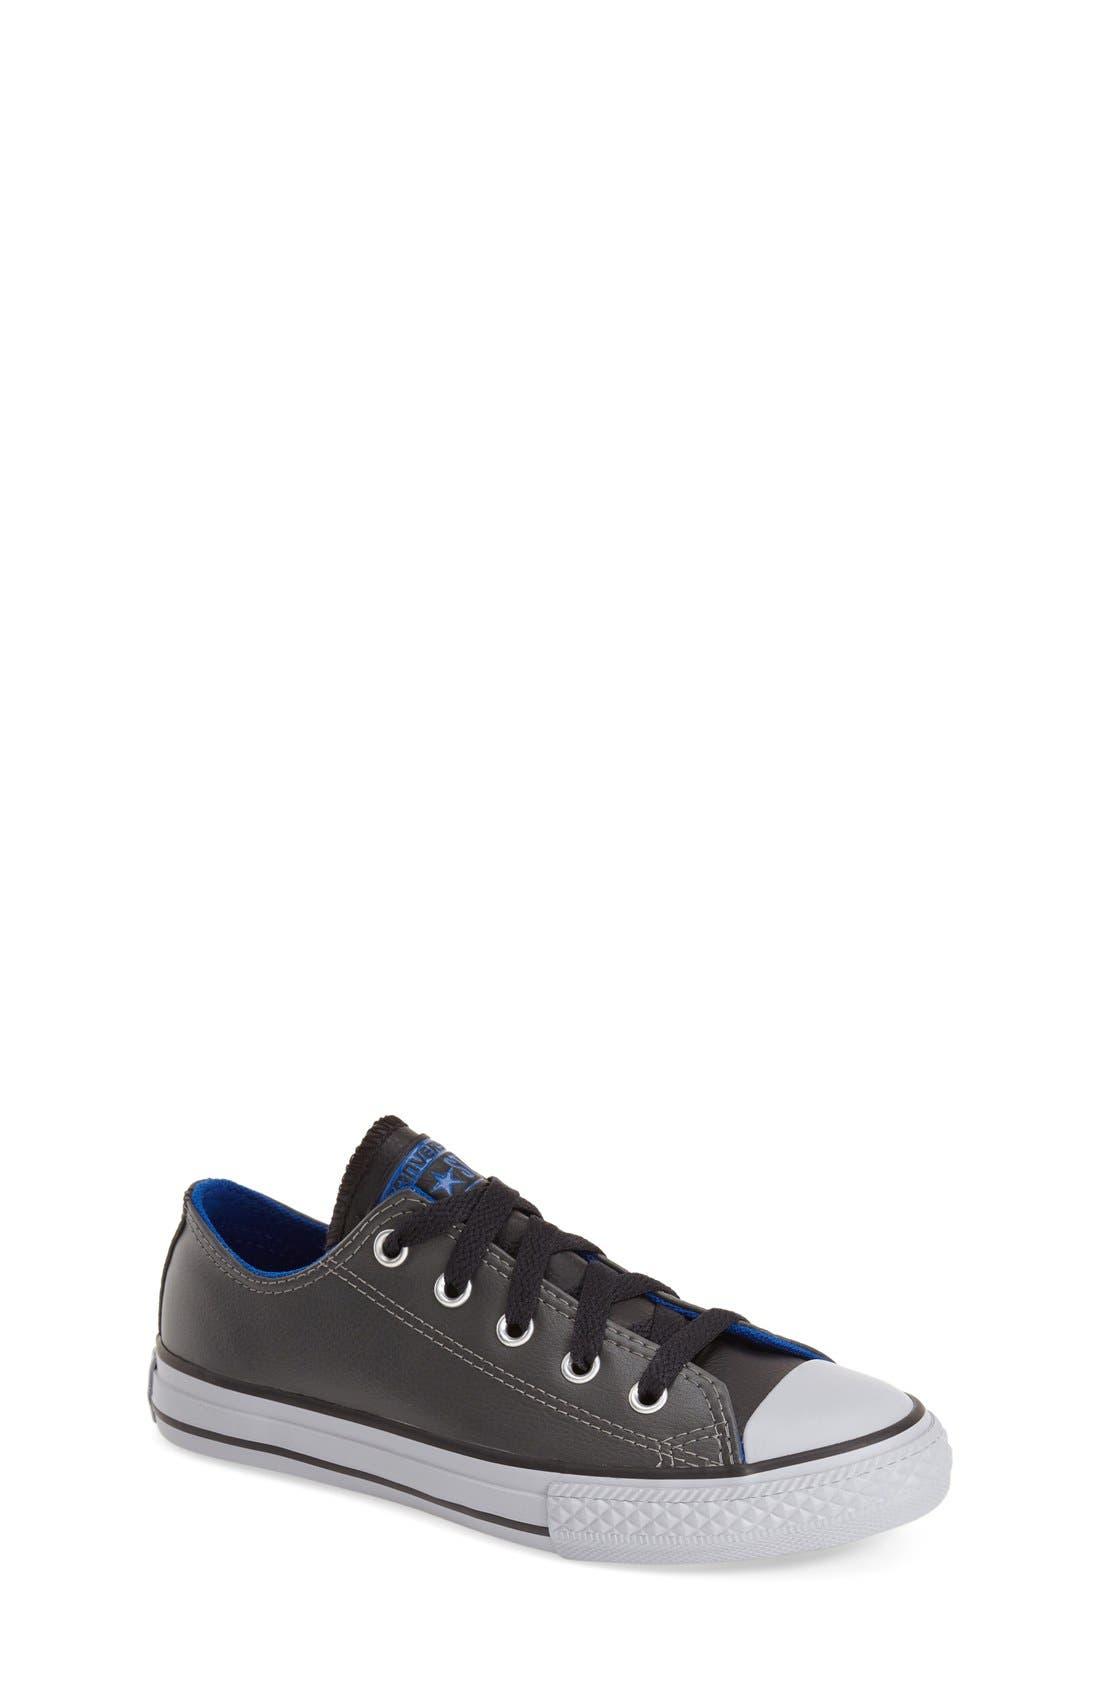 Main Image - Converse Chuck Taylor® All Star® 'Ox' Sneaker (Toddler, Little Kid & Big Kid)